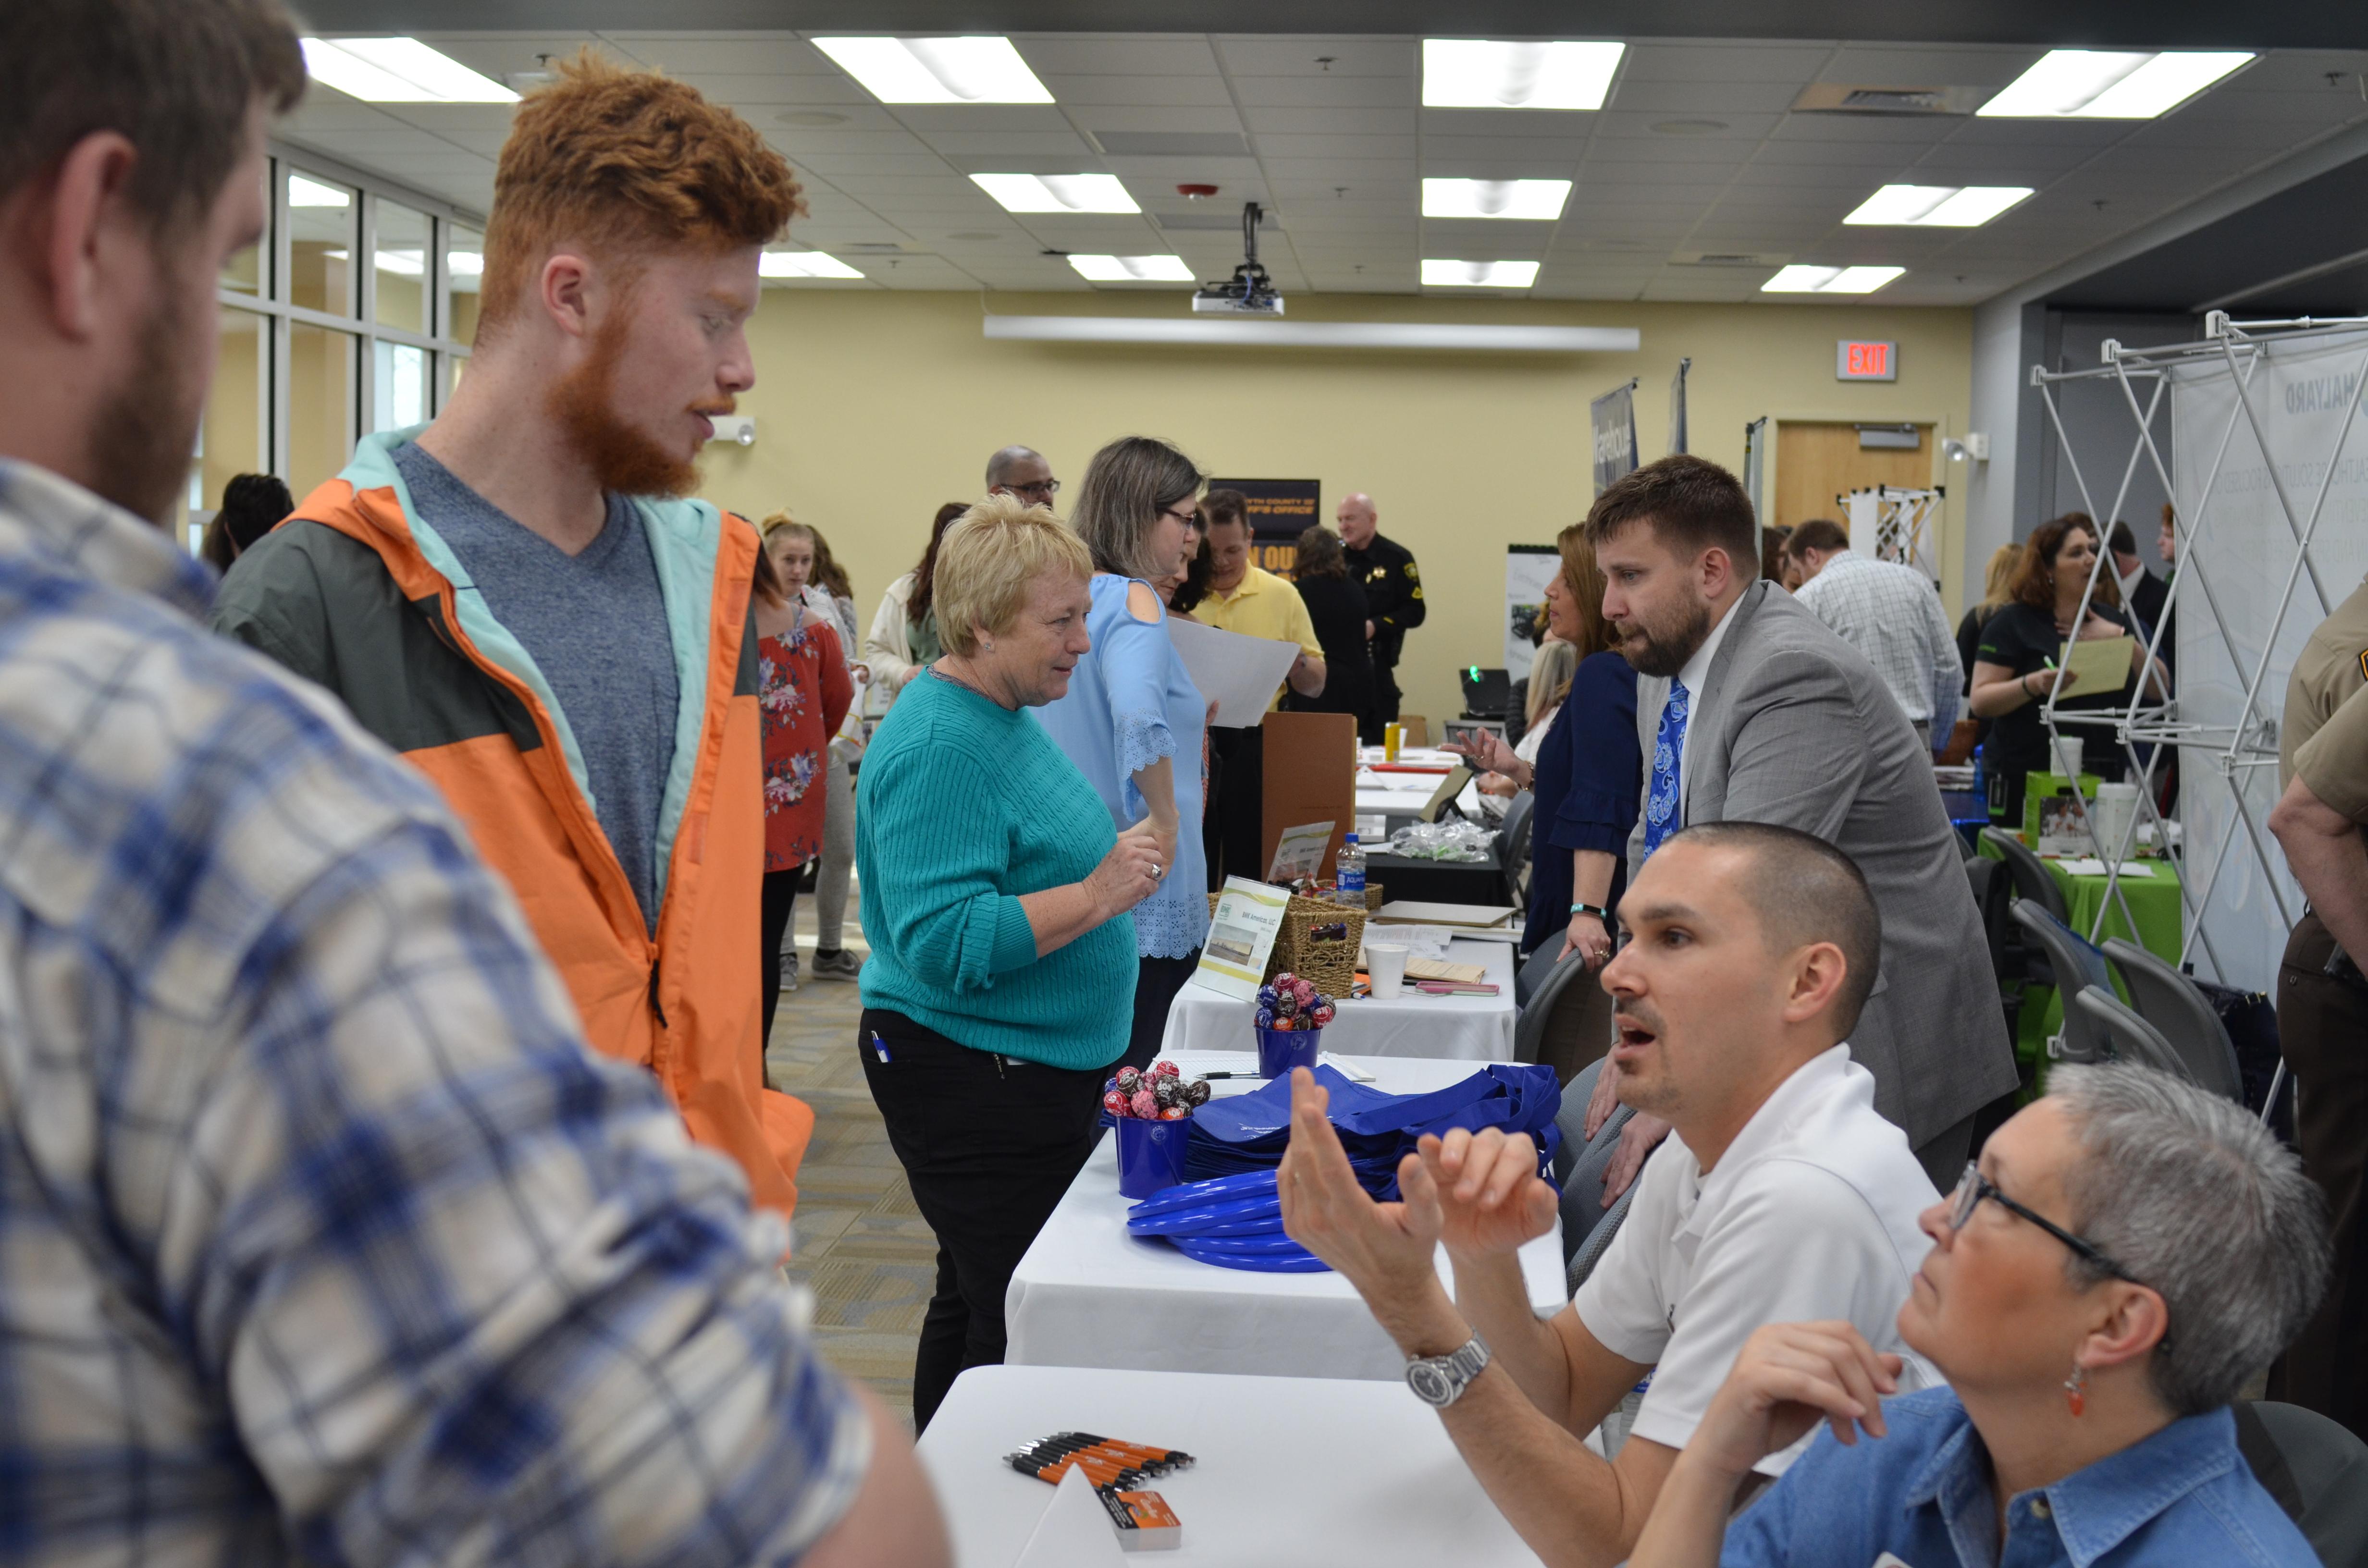 JobFair19_Photo - Davidson County Community College